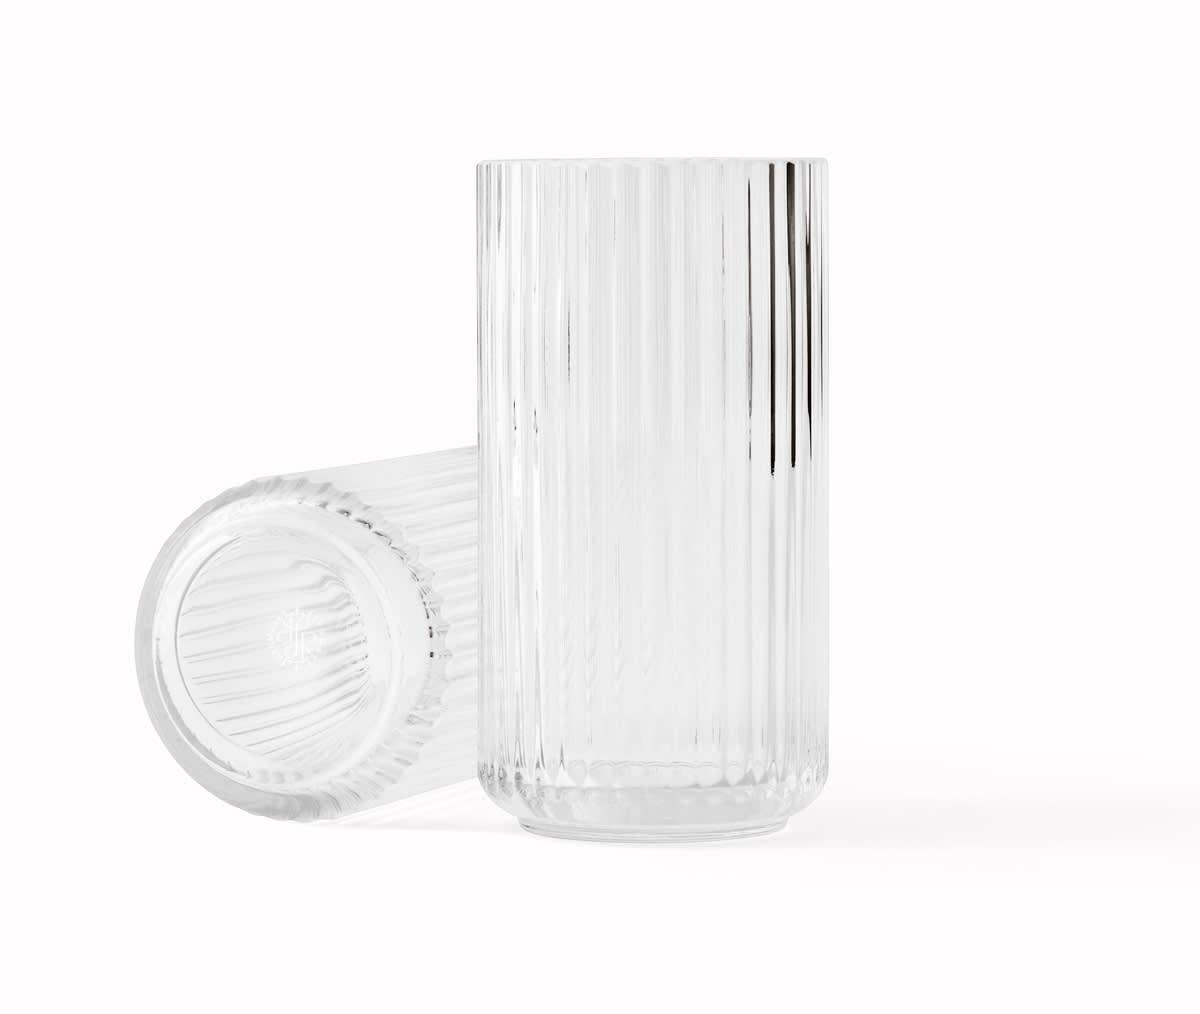 Lyngby Porcelain 20 CM Clear Glass Vase